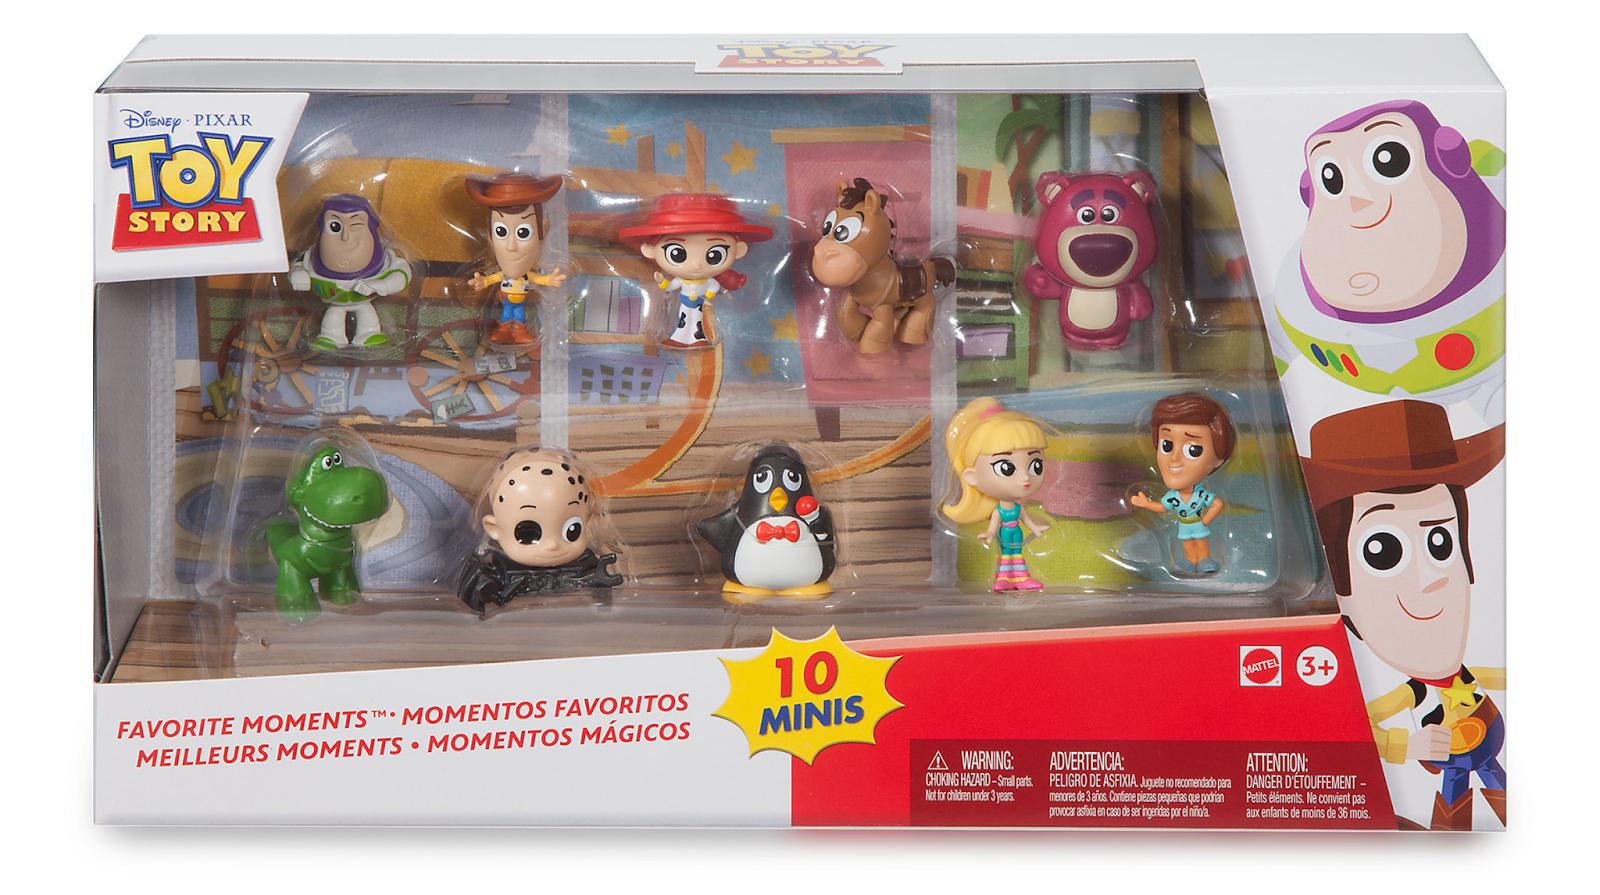 mattel toy story minis babyface figure